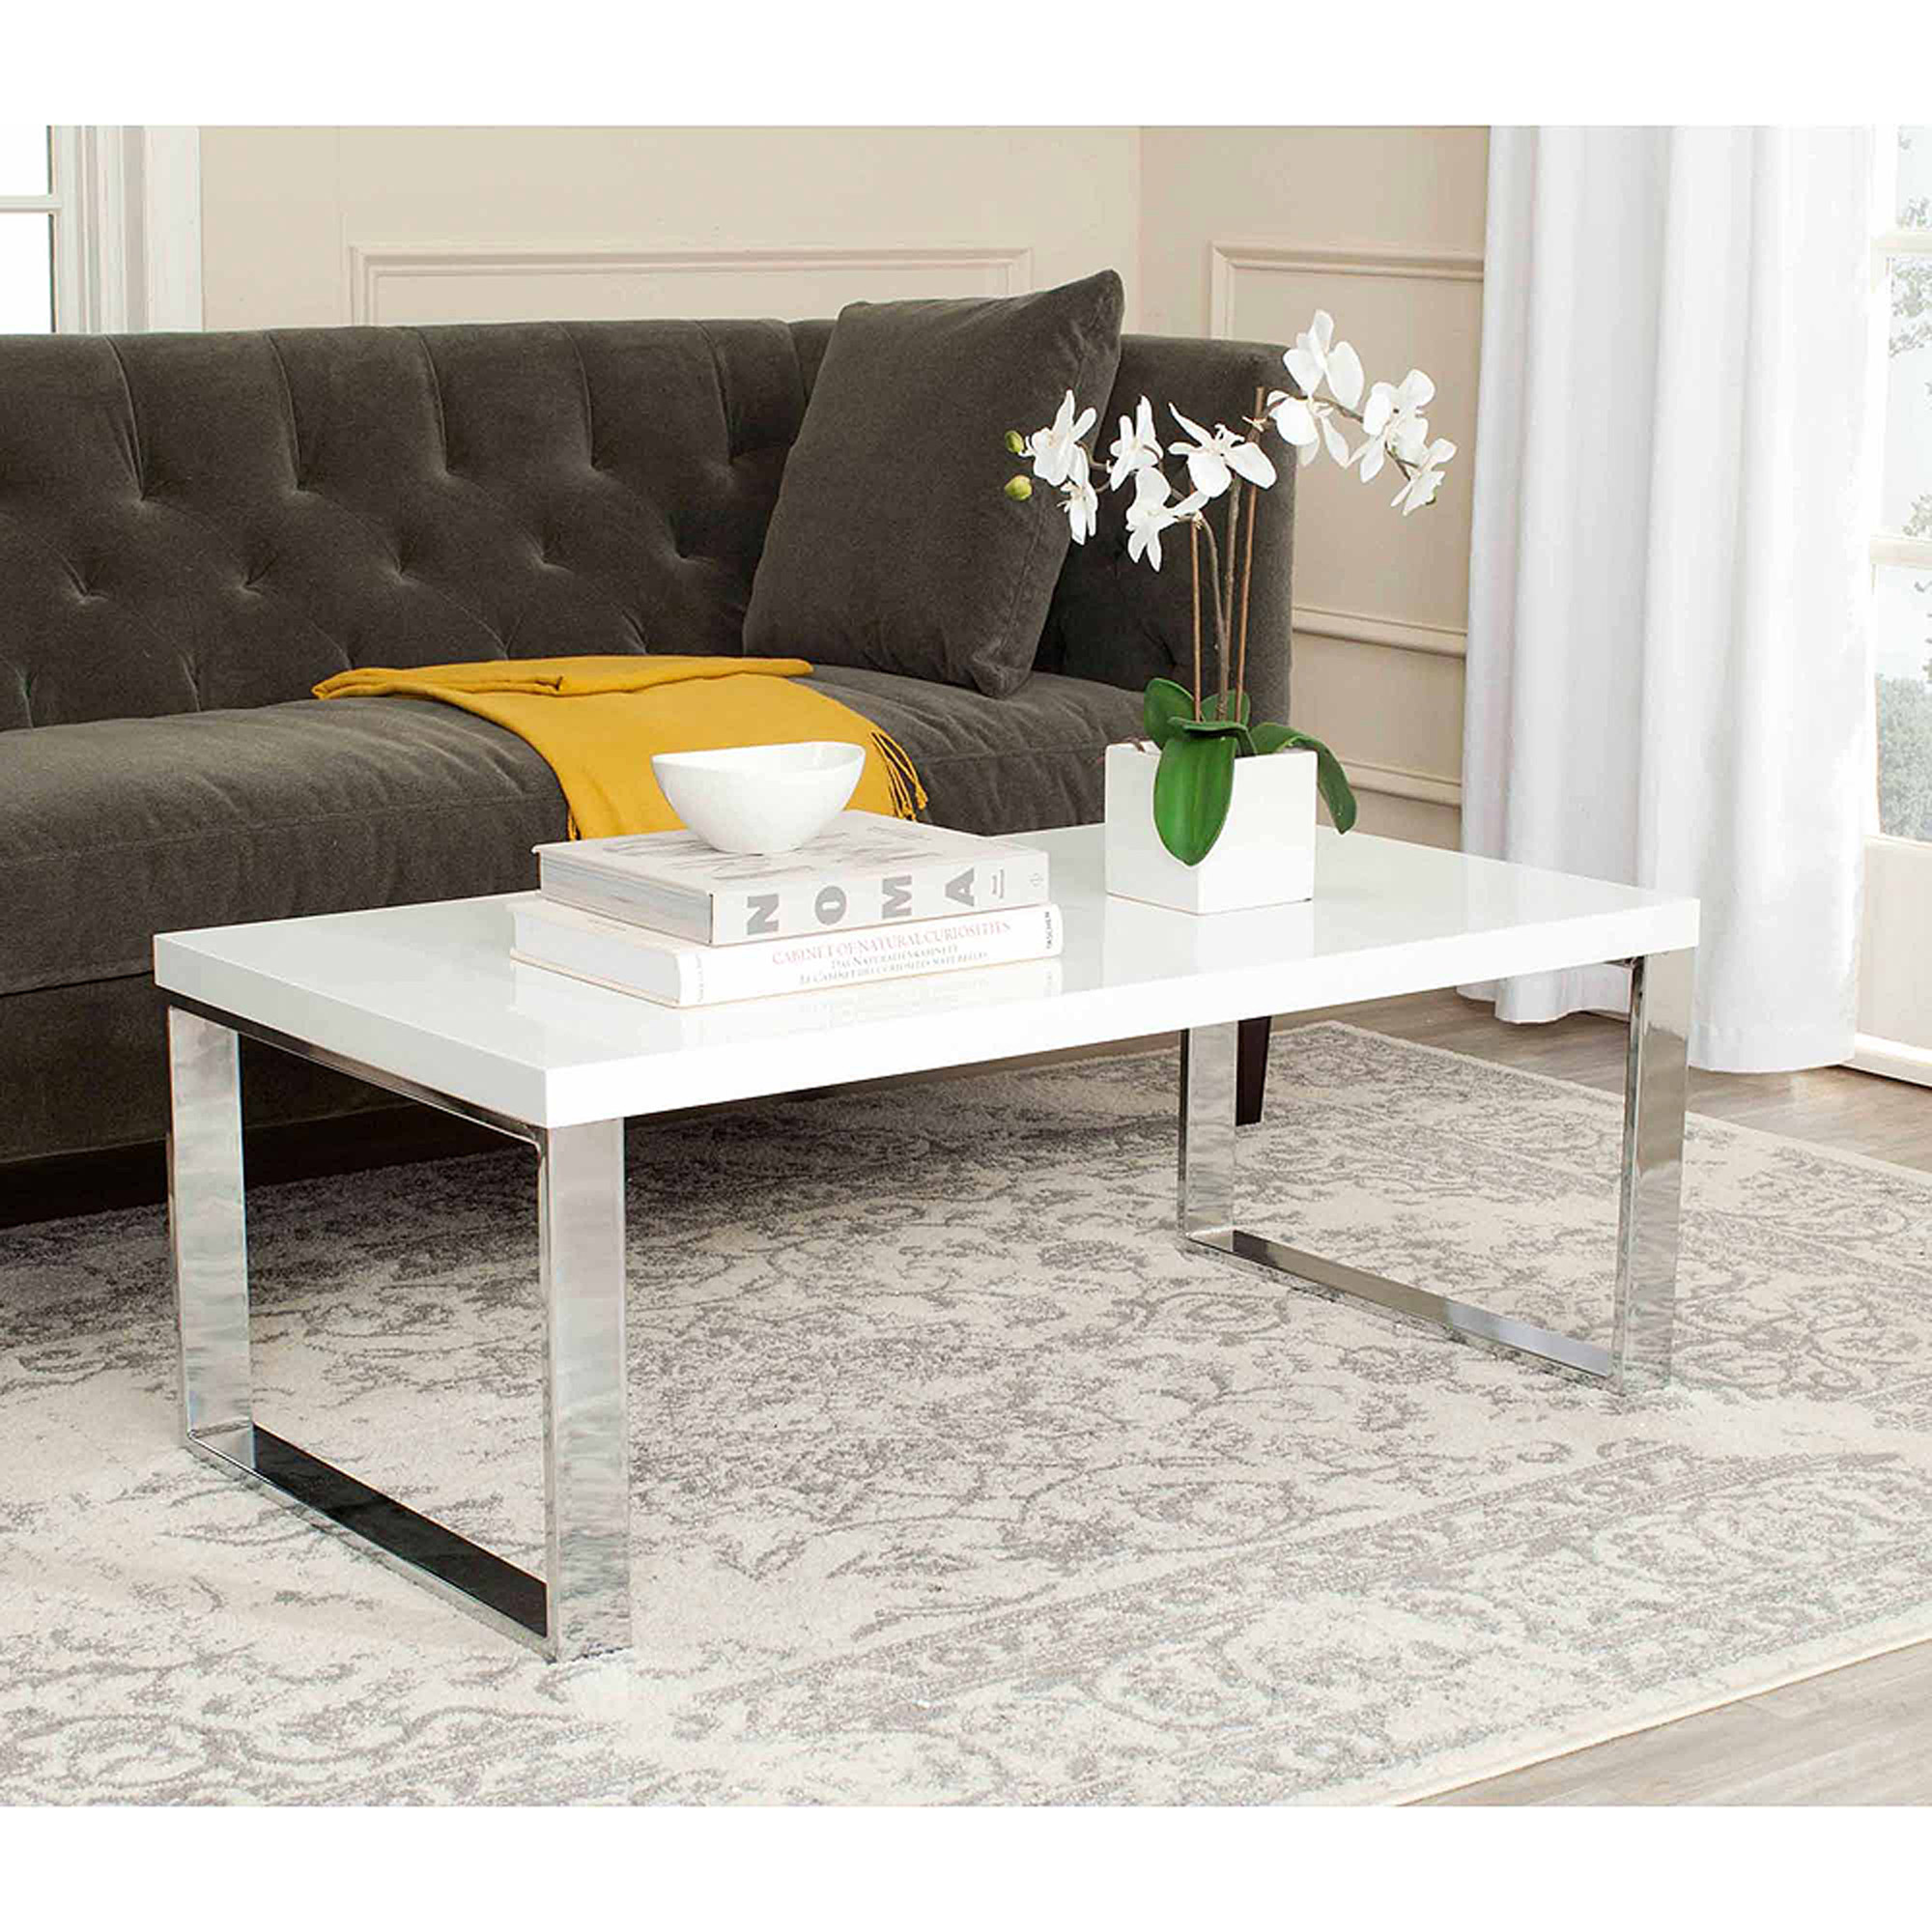 Safavieh Rockford Coffee Table, White and Chrome